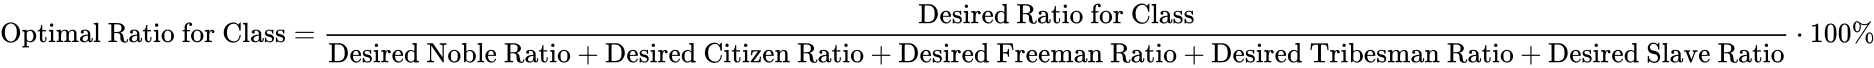 {\displaystyle {\text{Optimal Ratio for Class}}={\frac {\text{Desired Ratio for Class}}{{\text{Desired Noble Ratio}}+{\text{Desired Citizen Ratio}}+{\text{Desired Freeman Ratio}}+{\text{Desired Tribesman Ratio}}+{\text{Desired Slave Ratio}}}}\cdot 100\%}